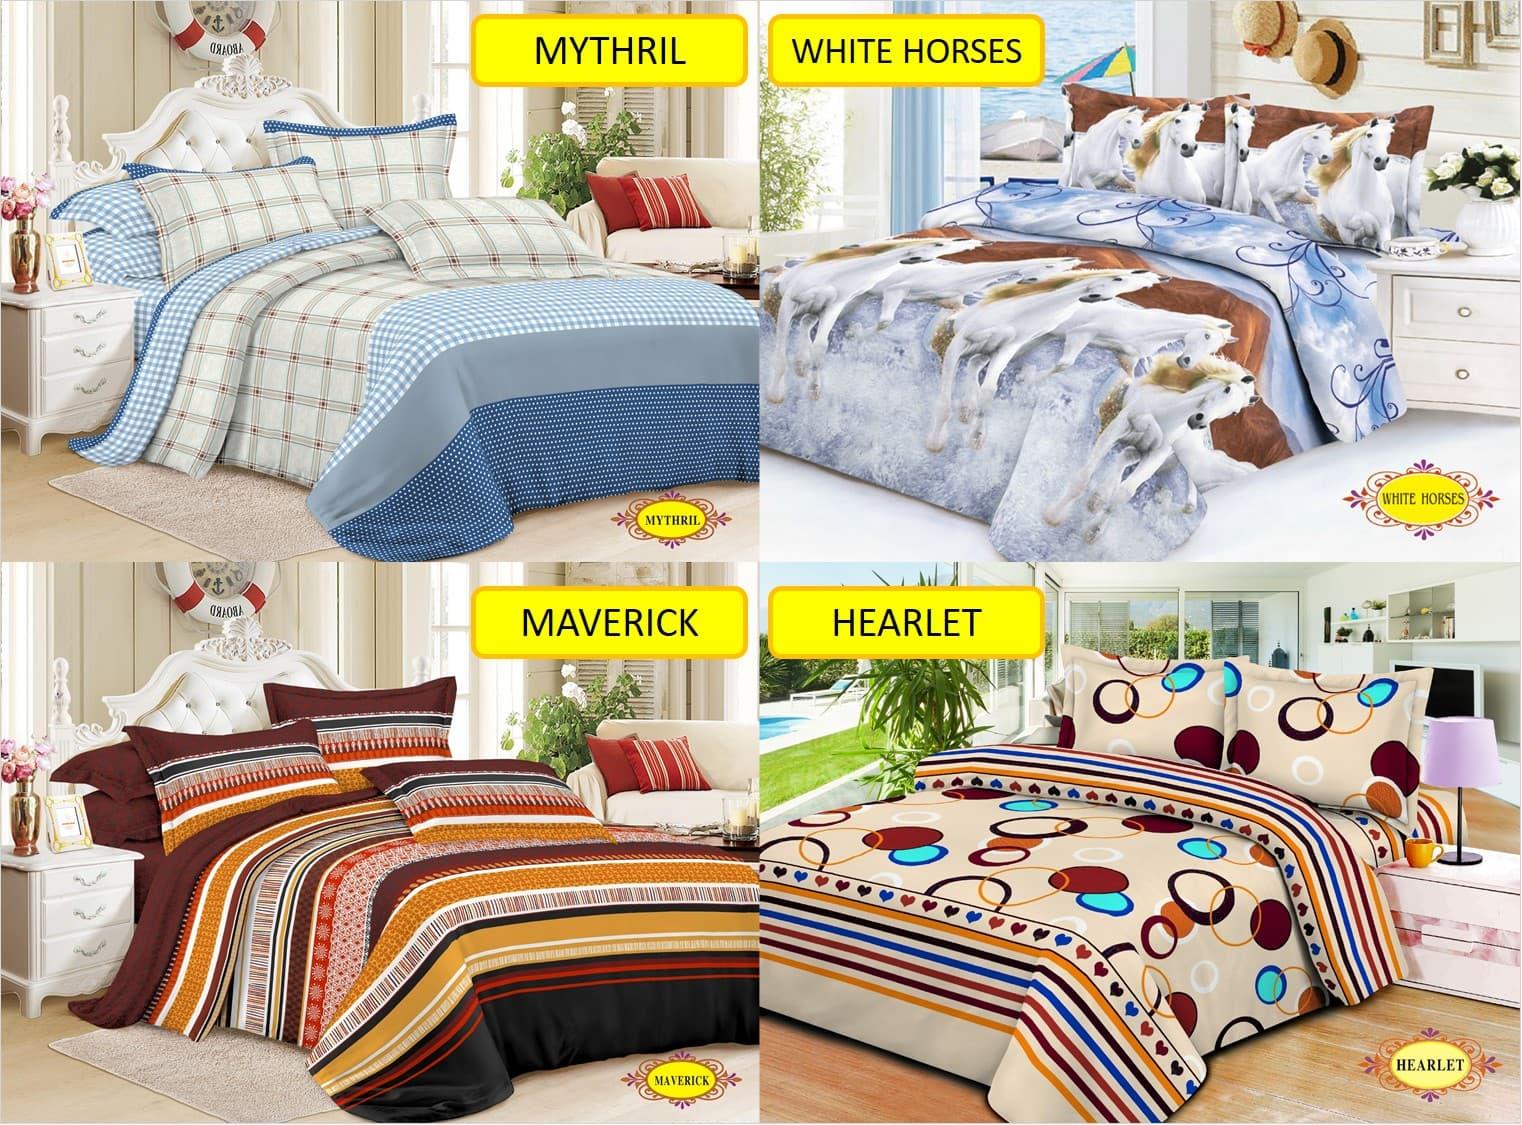 Lidia Bed Cover Sprei Set 120x200x20 No 3 Single Size White Horses Orina Motif Fami King 180x200x20cm Jual Promo 120x200 No3 Dede Chamber